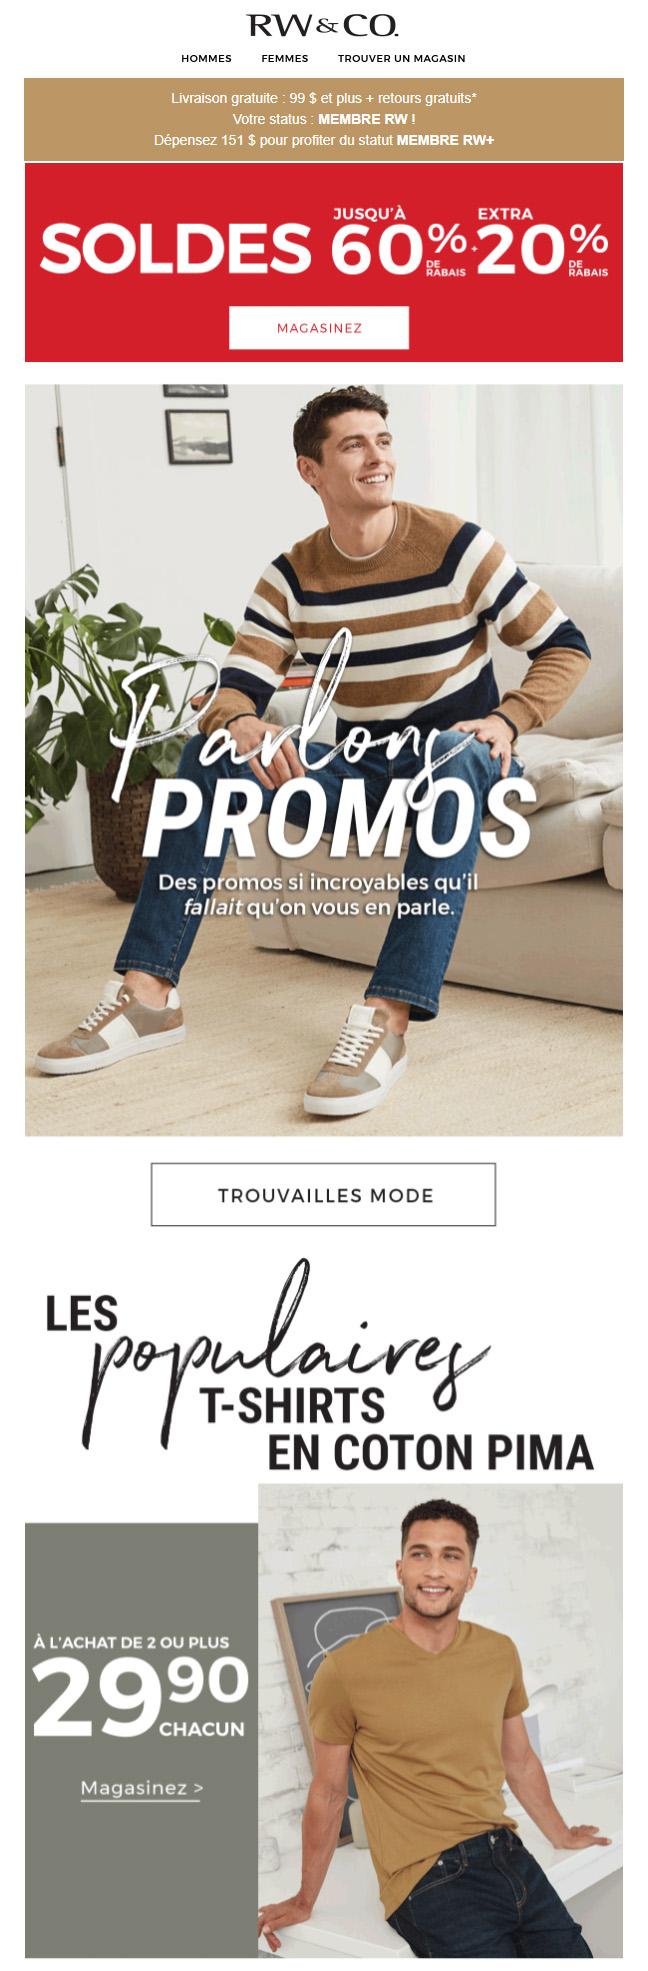 Parlons Promos